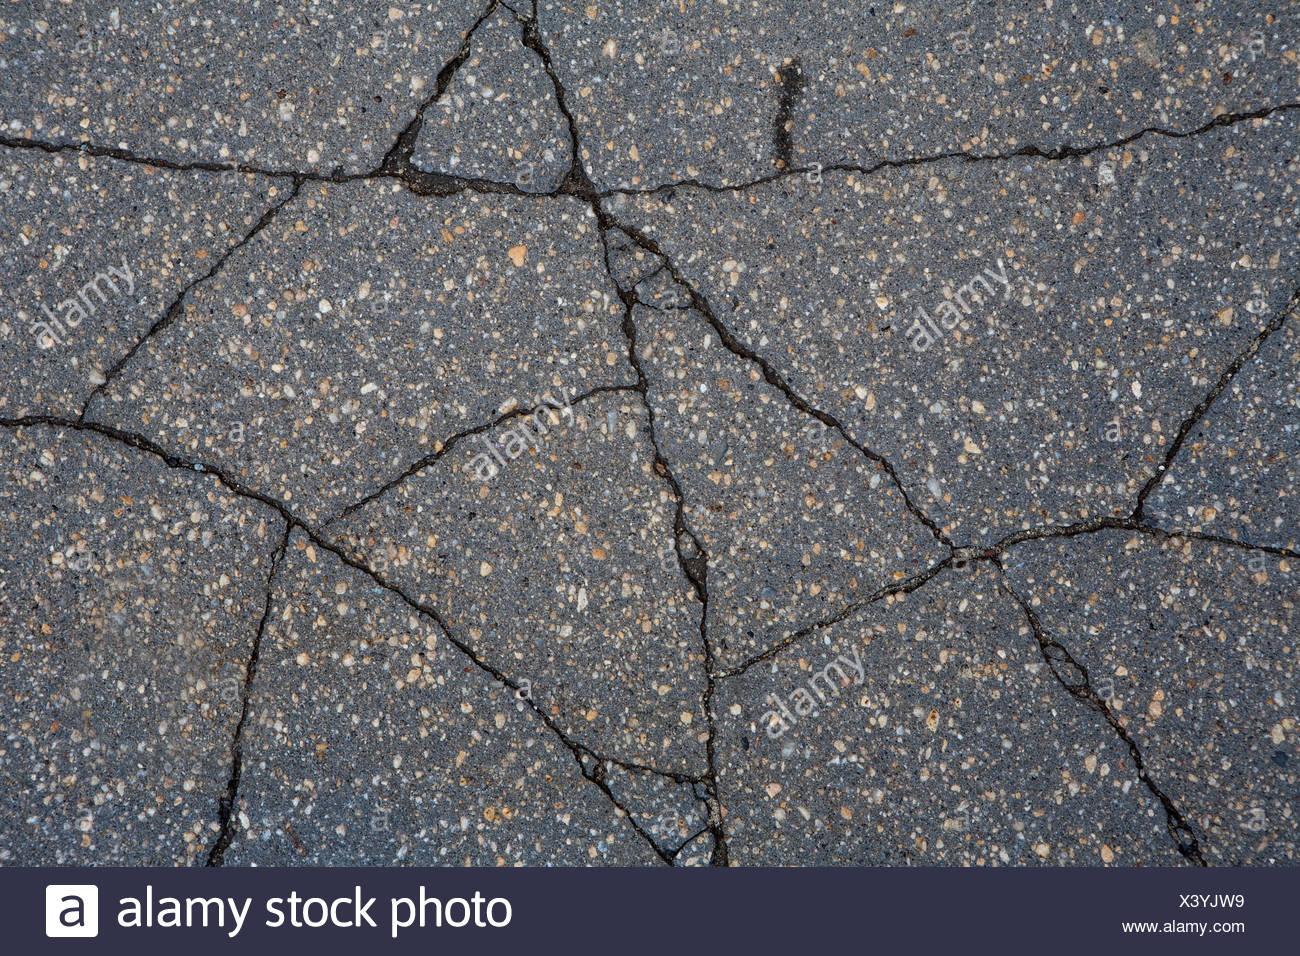 Cracked Concrete Stock Photos & Cracked Concrete Stock